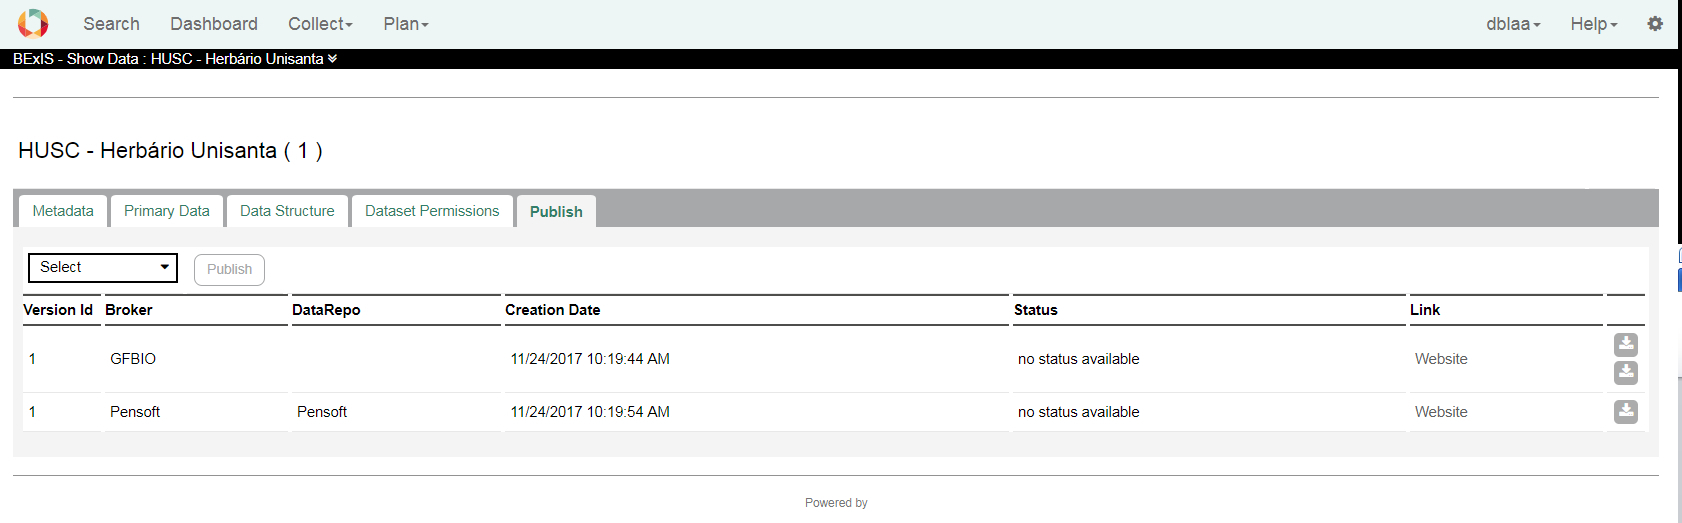 Sharing Metadata Xml | Calendar For Planning throughout Sharing Metadata Xml Outlook Calendar